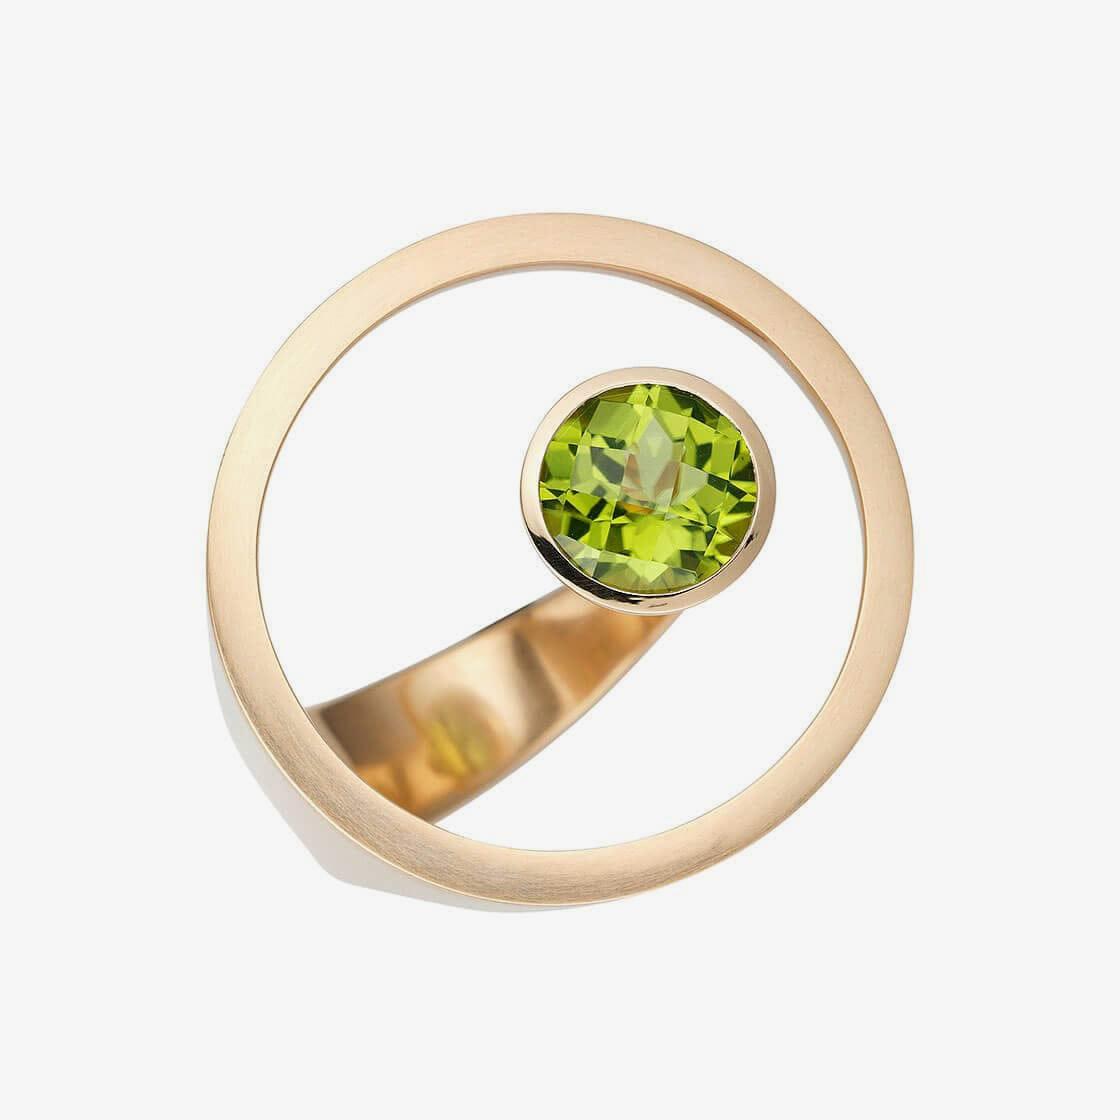 huebel-ring-schatzinsel-peridot-01